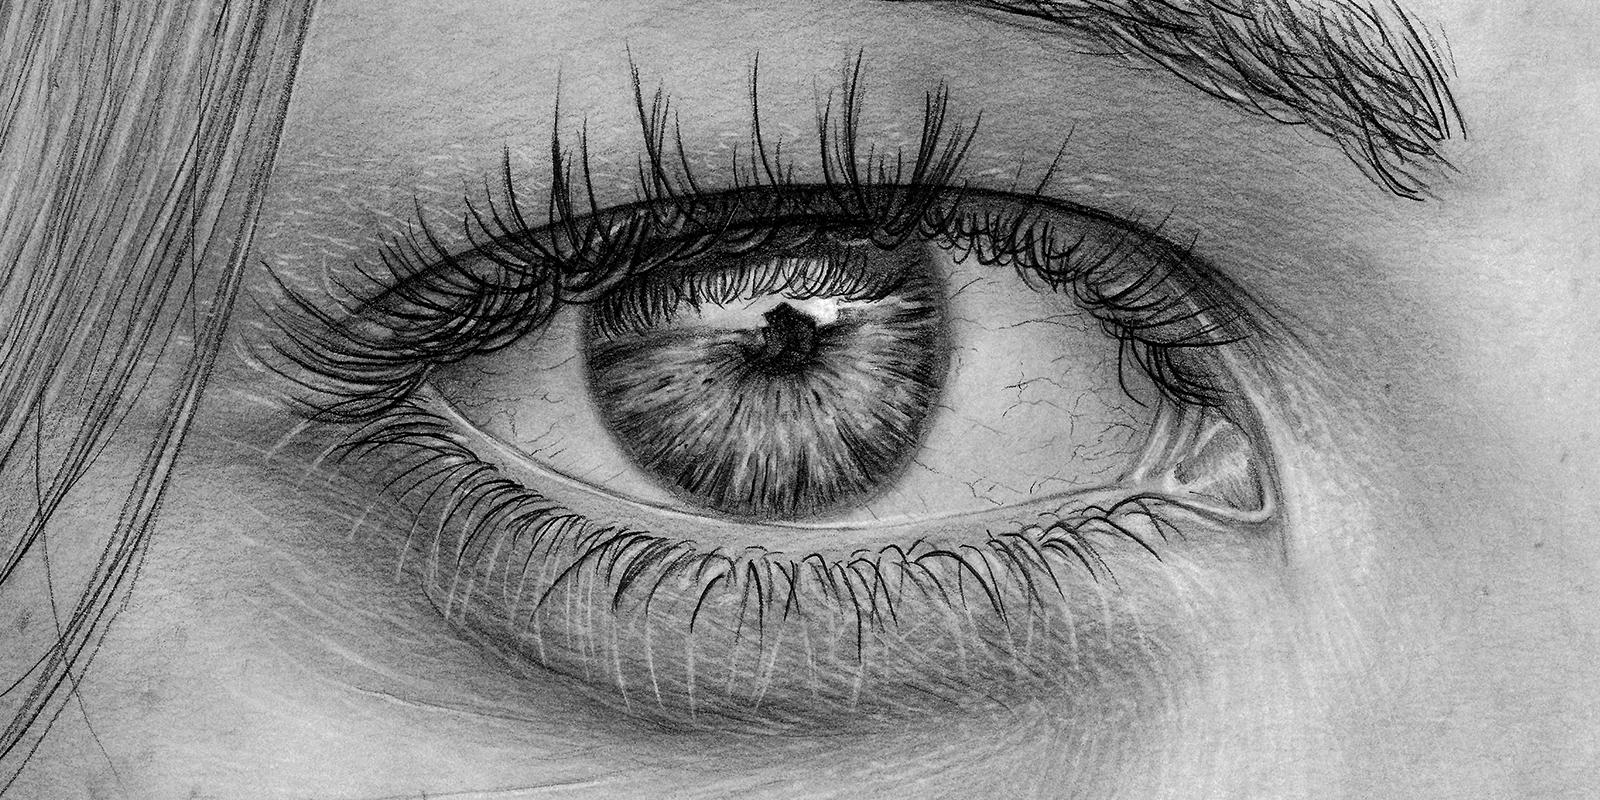 Cloe up eye drawing by Brad Thingvold